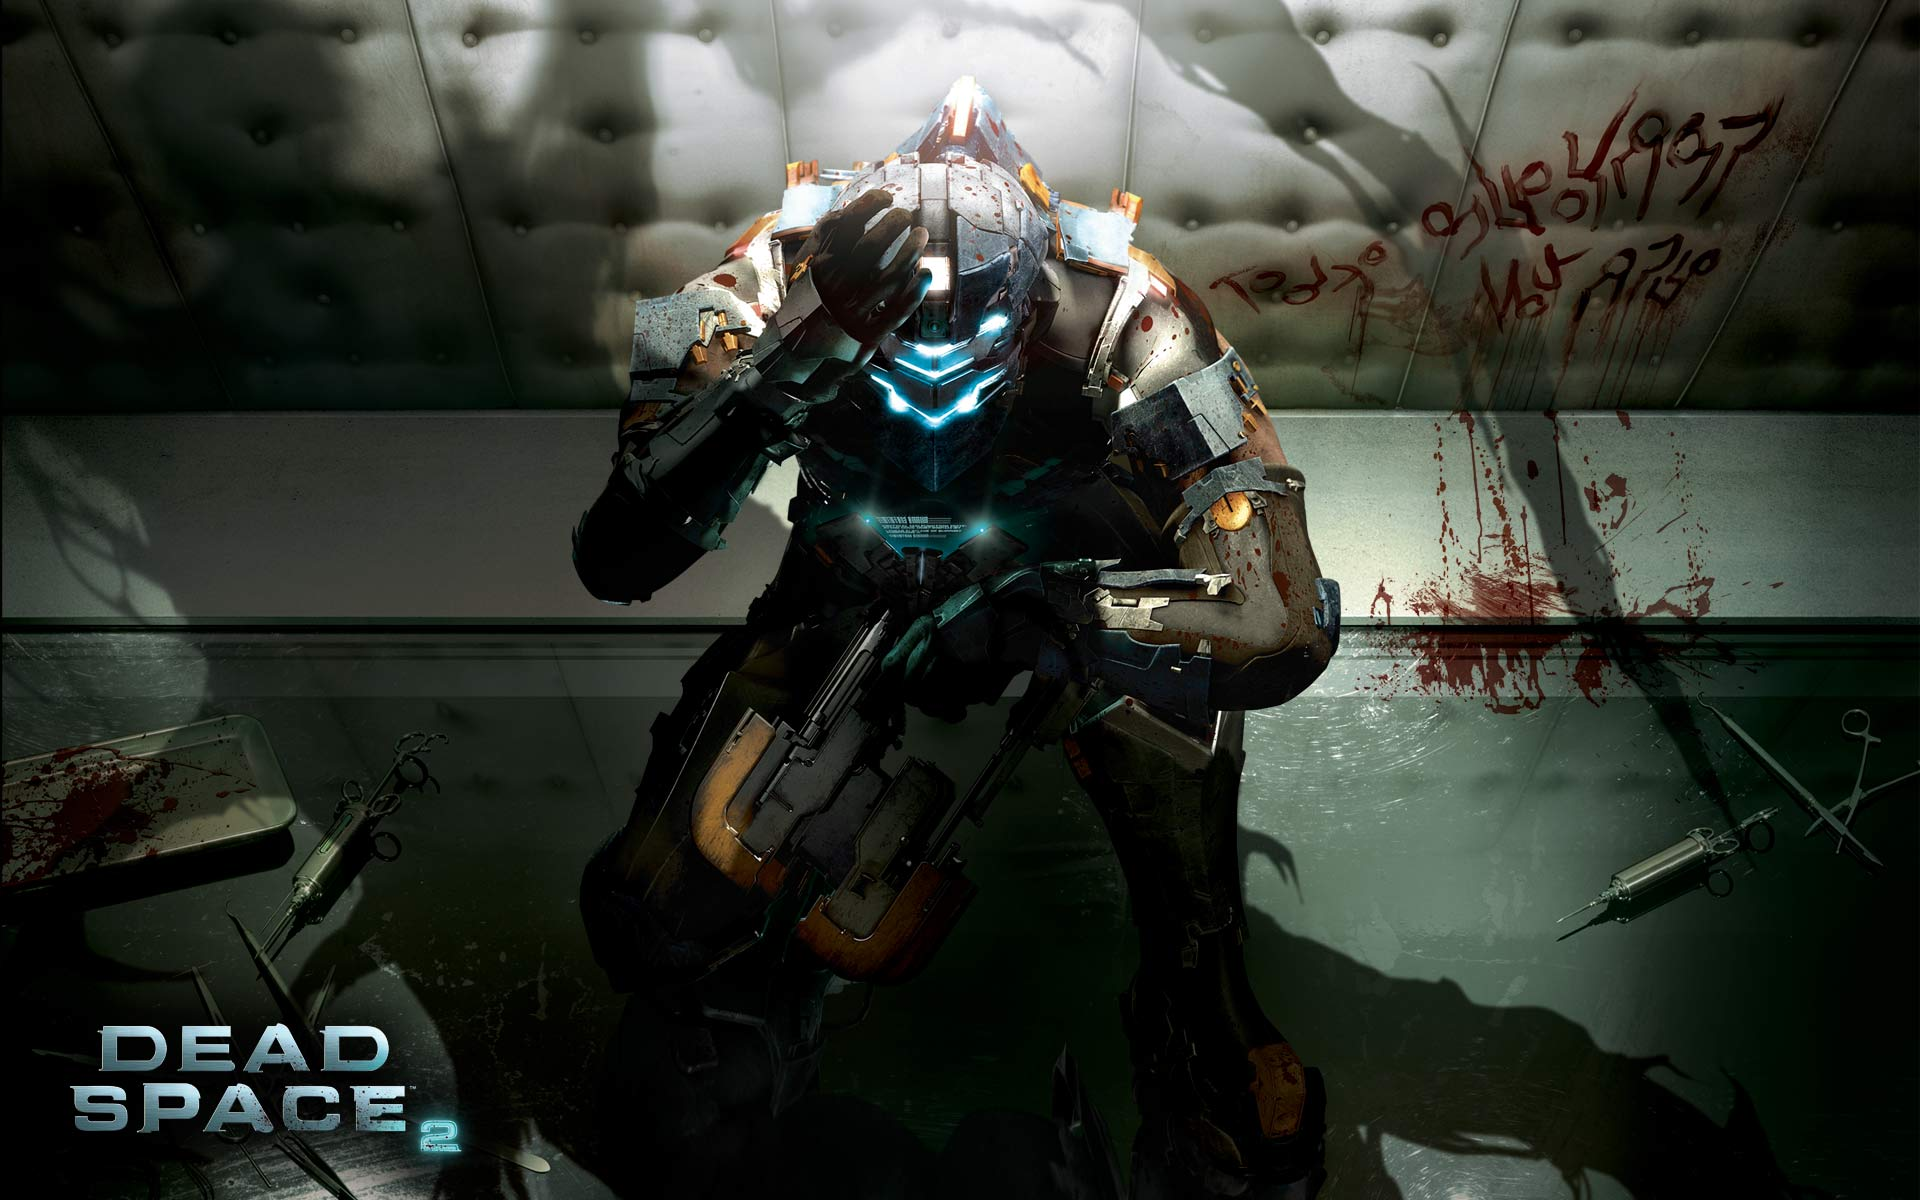 DeadSpace2 Wallpaper1 Art003